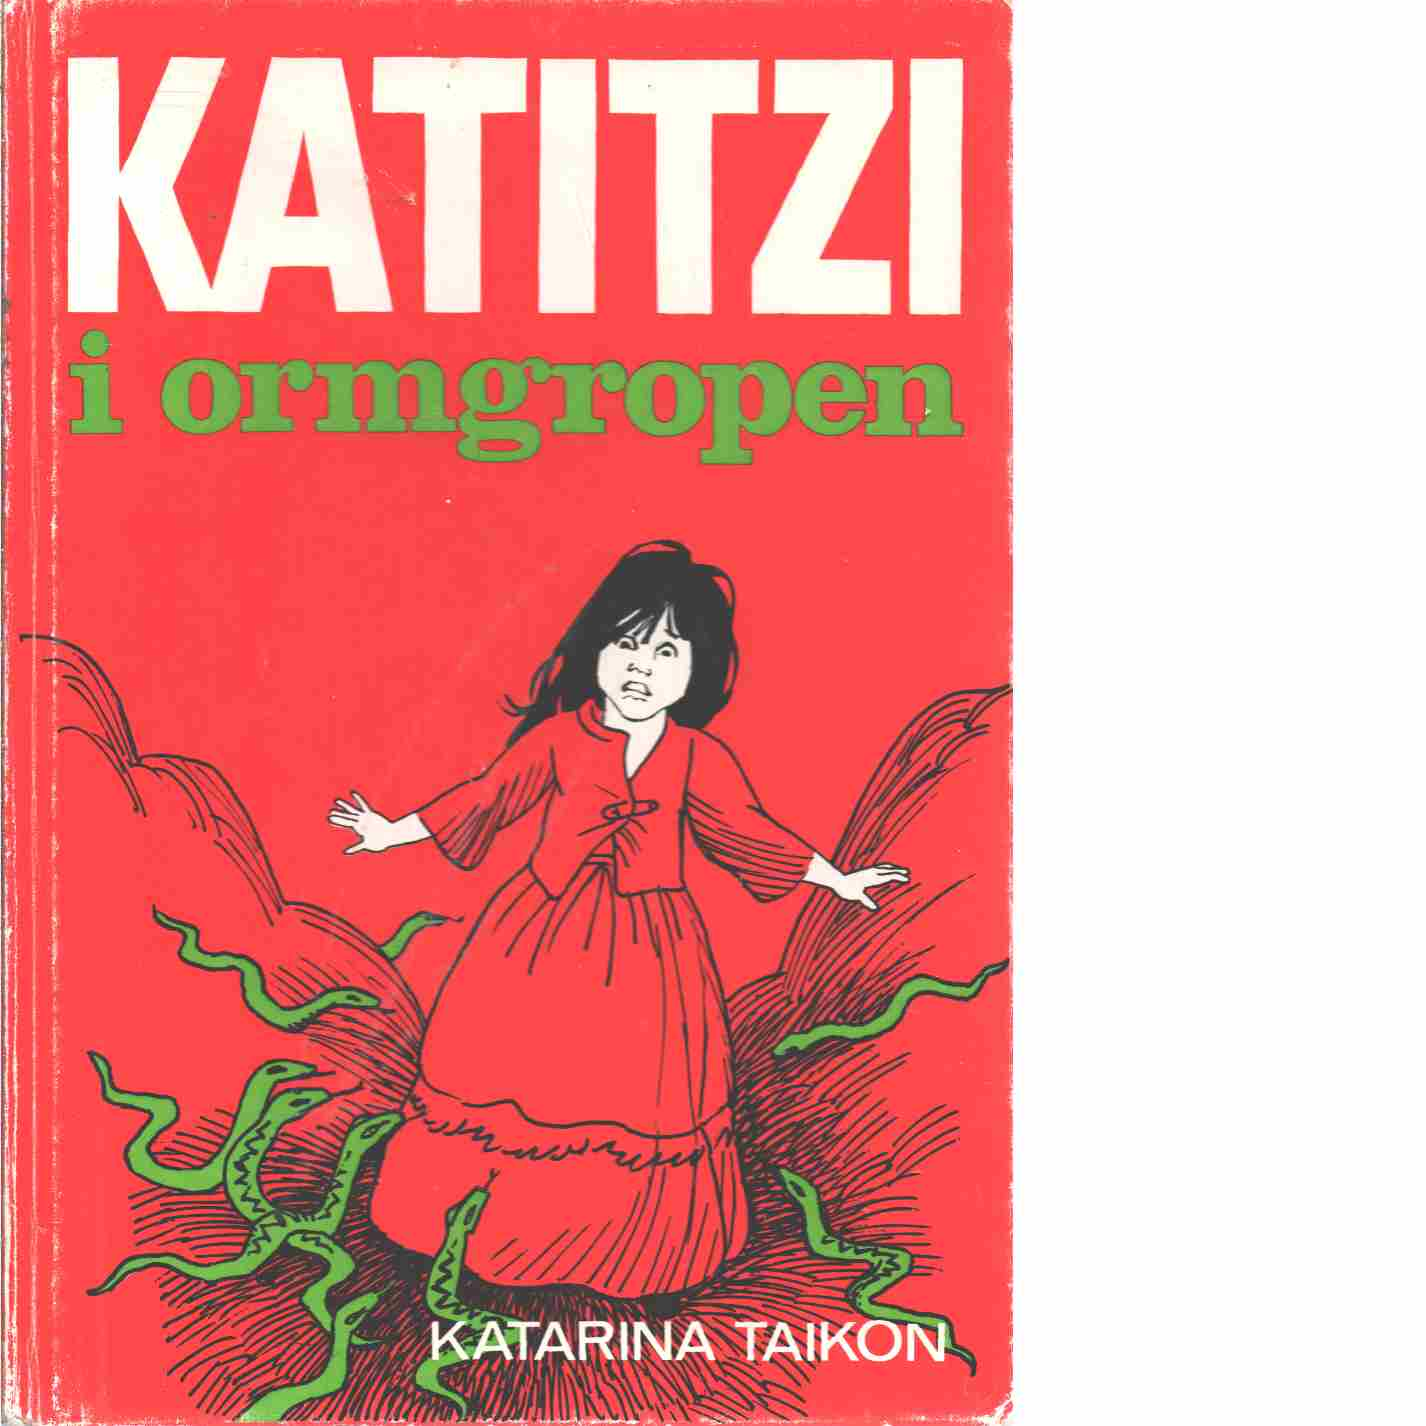 Katitzi i ormgropen - Taikon, Katarina